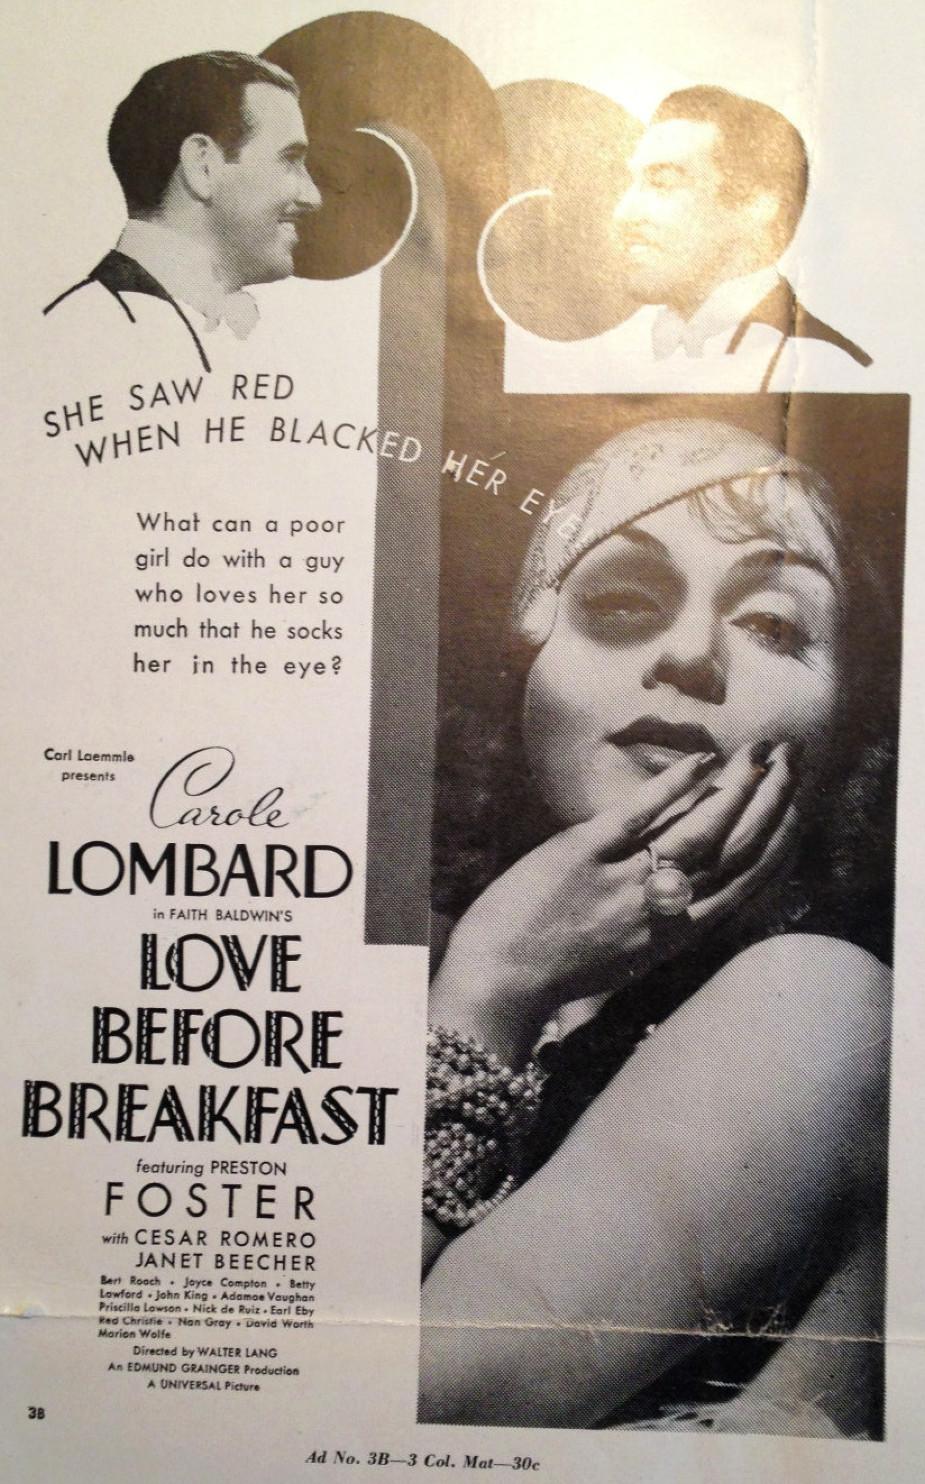 carole lombard love before breakfast pressbook 07a